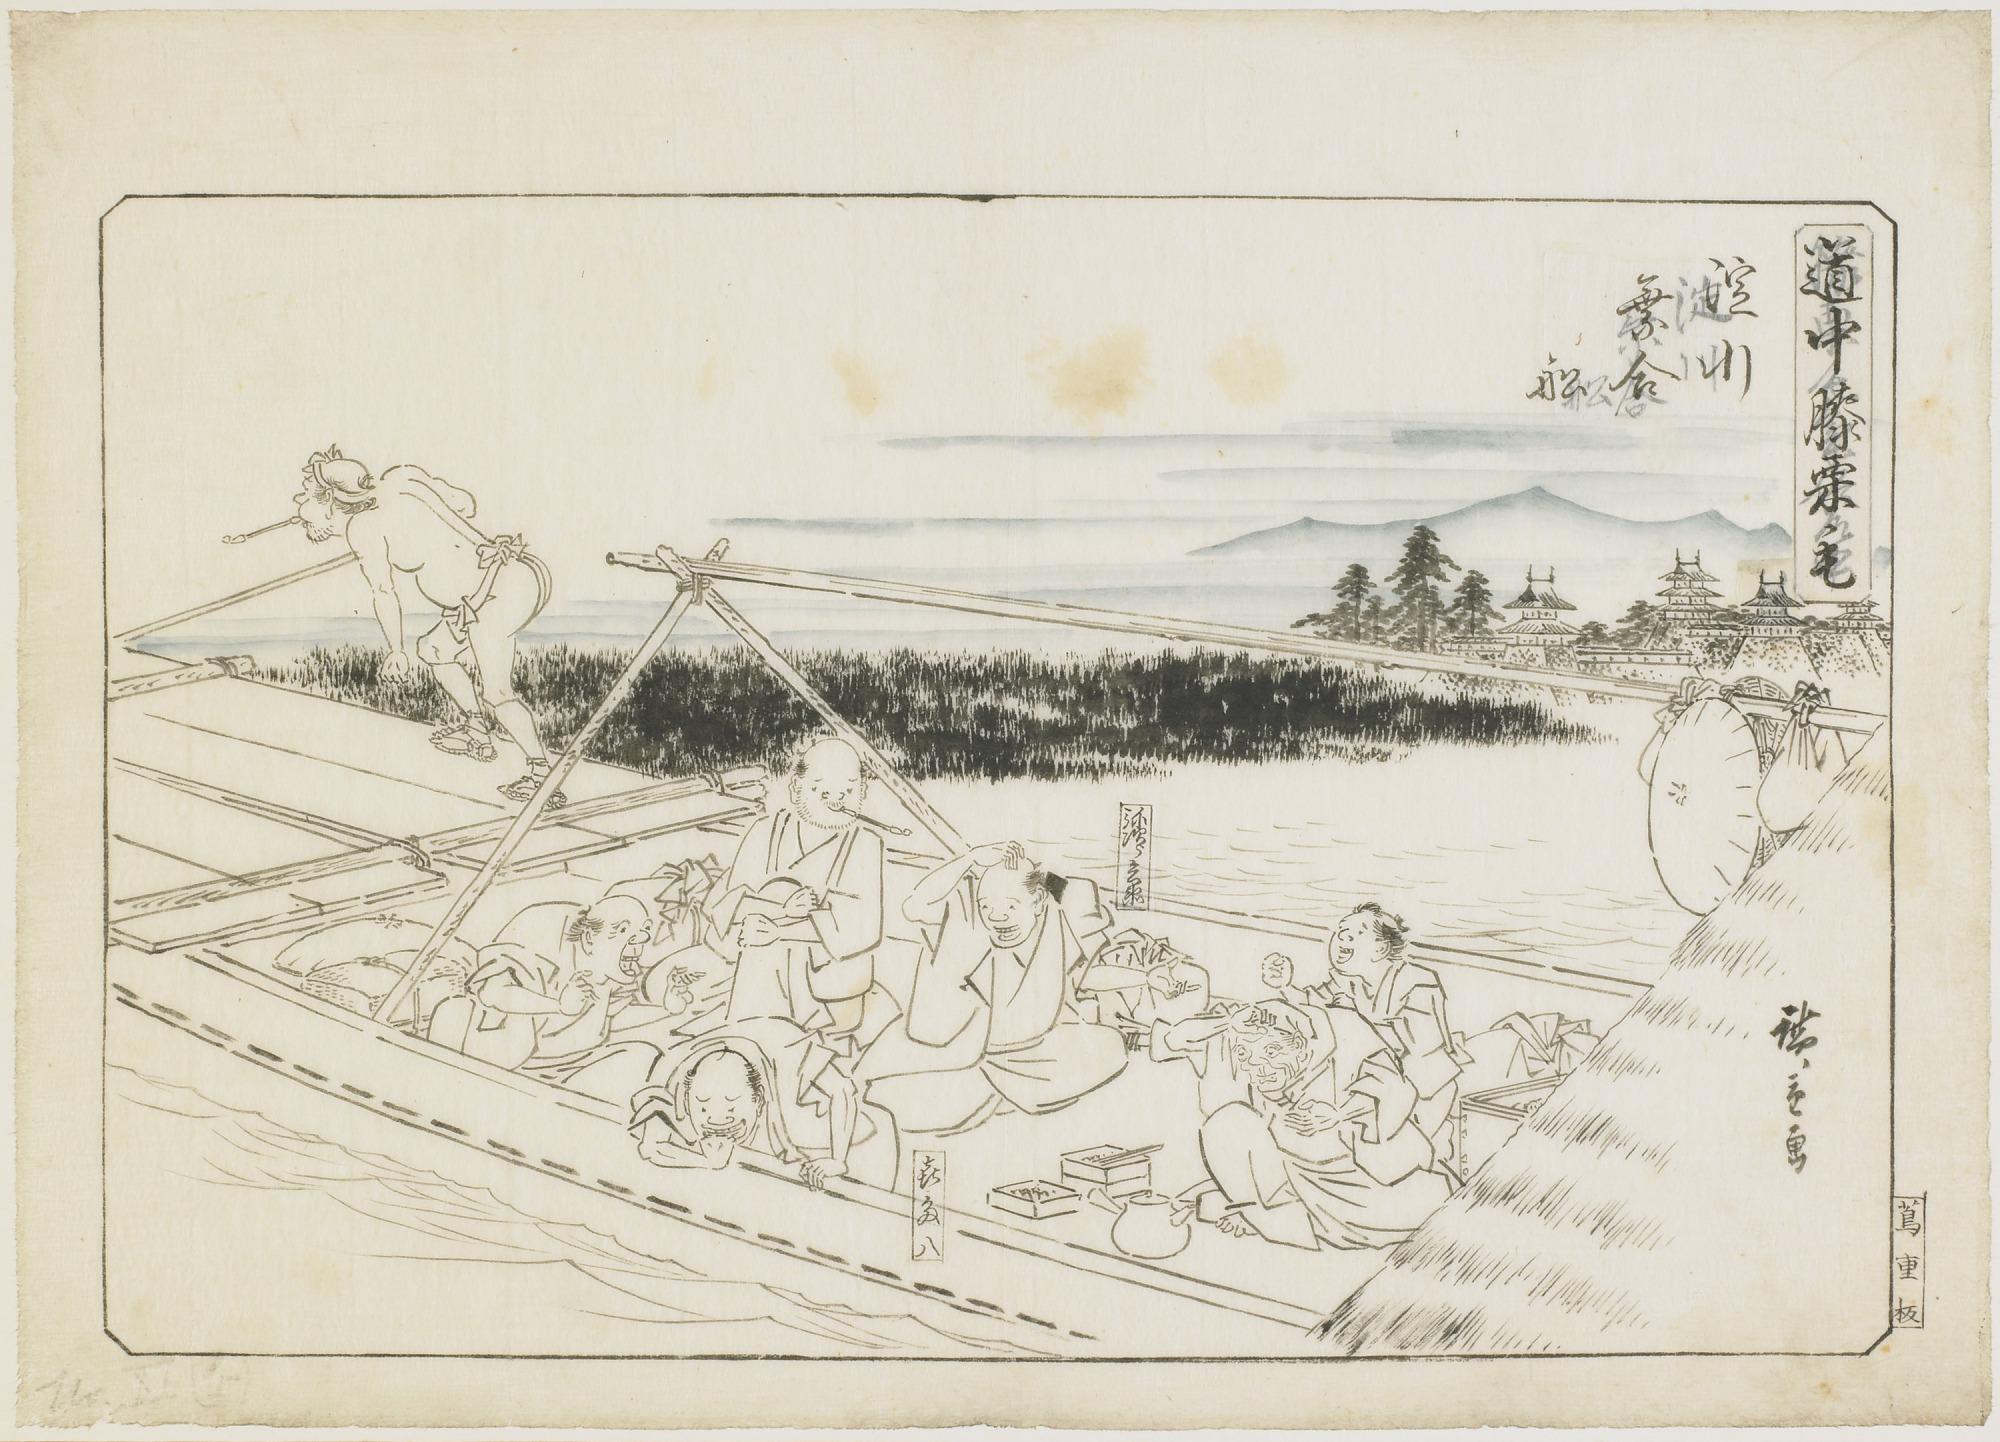 Drawing (hanshita-e) for a woodblock print from the Dochu hizakurige series